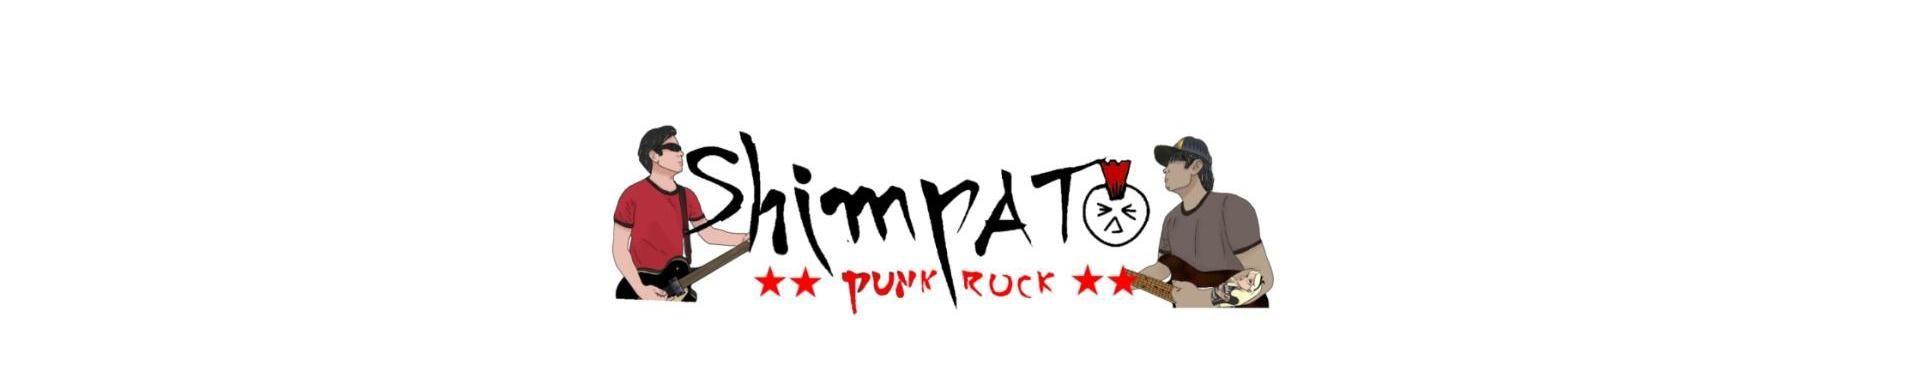 Imagem de capa de Shimpato Punk Rock